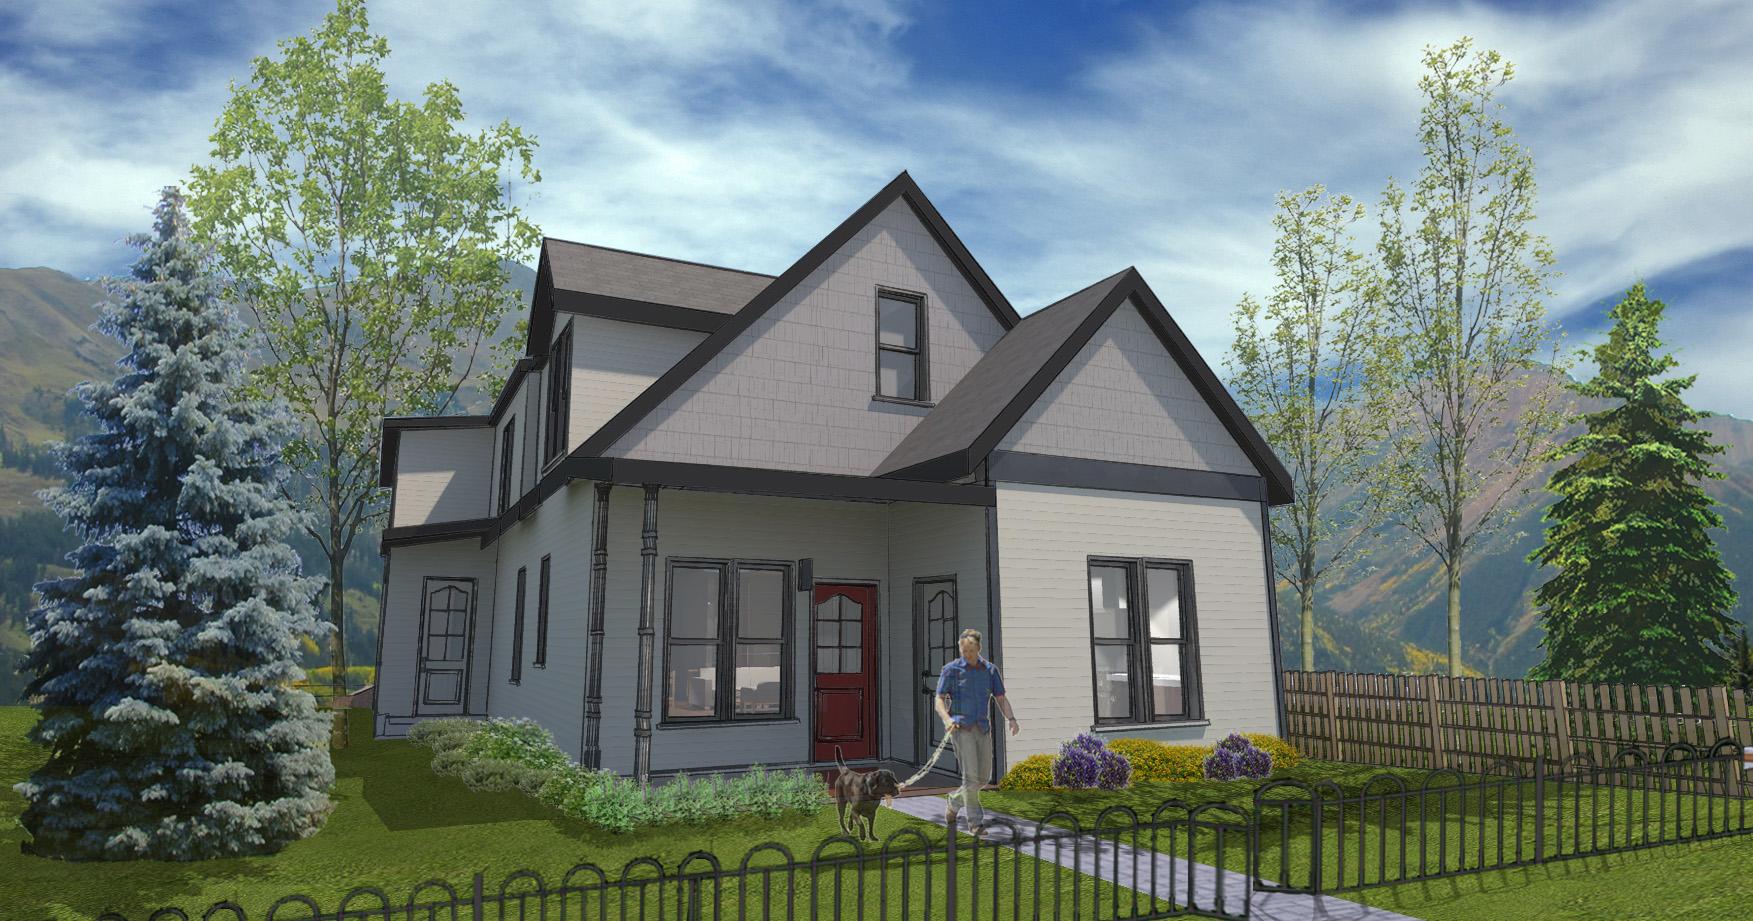 Tek Ailelik Ev için Satış at Contemporary West End Retreat 712 West Francis Street West End, Aspen, Colorado 81611 Amerika Birleşik Devletleri